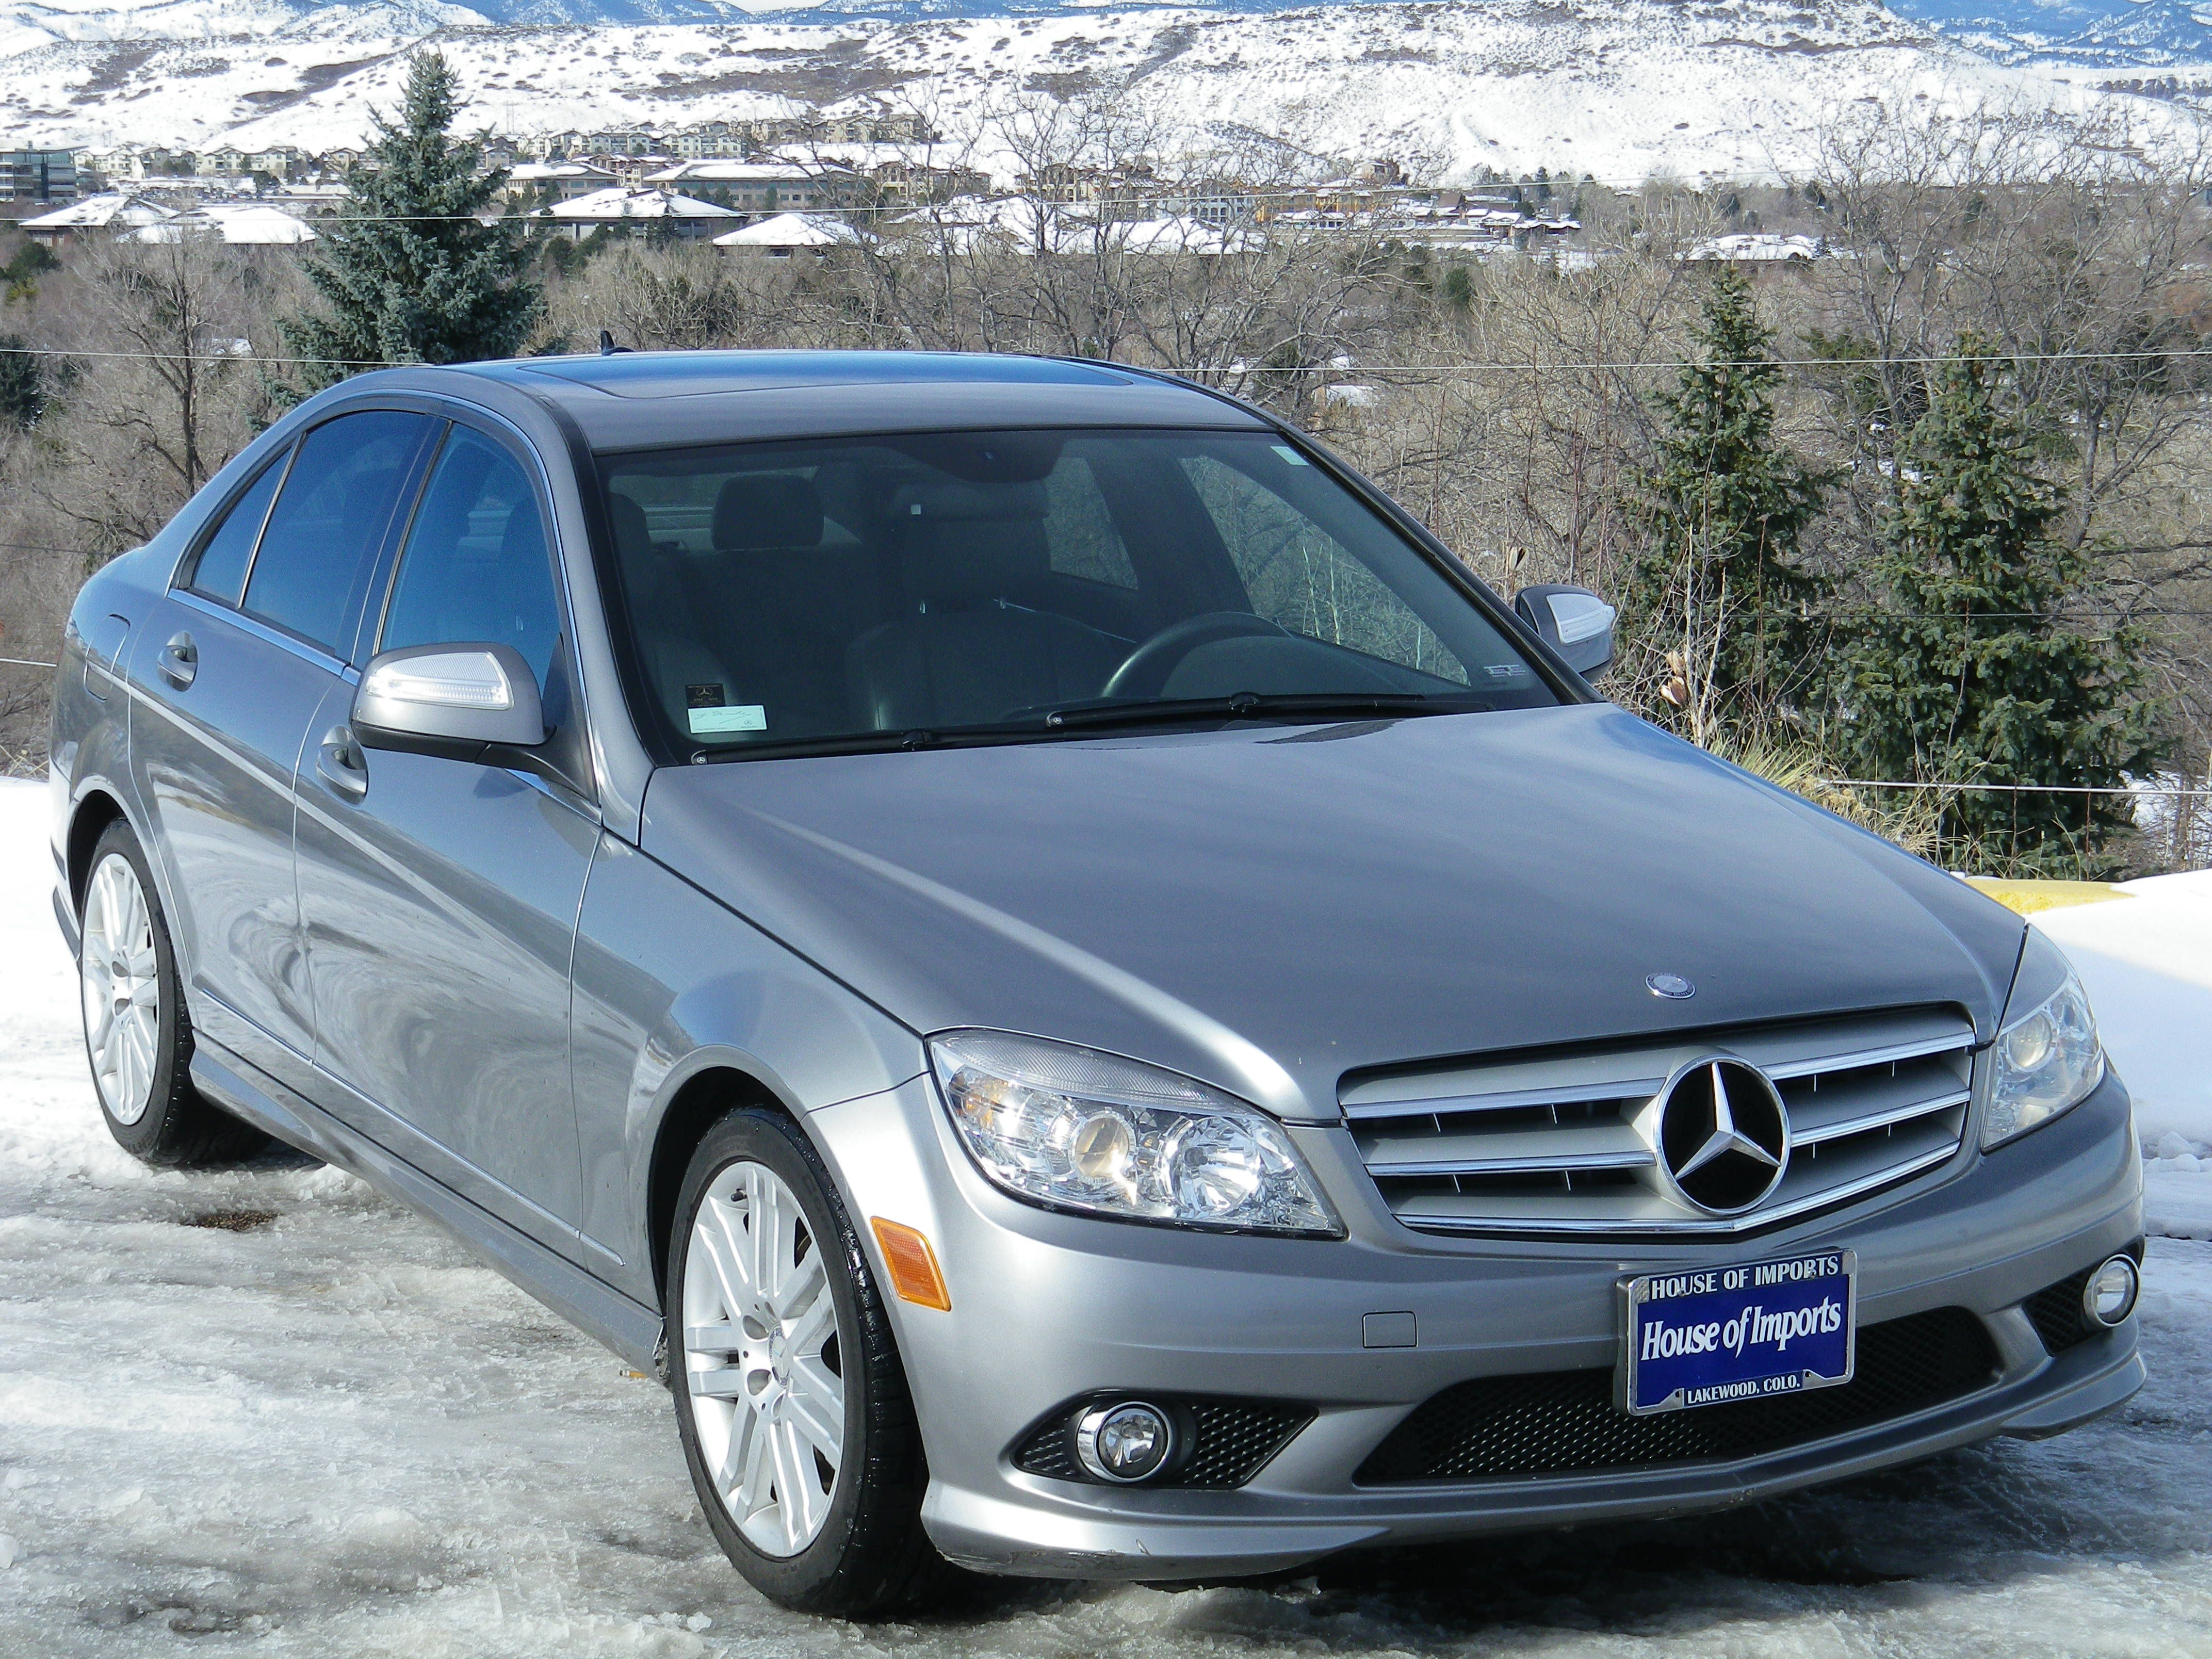 2008 Mercedes Benz C300 4 Matic Odometer 79 455 V I N